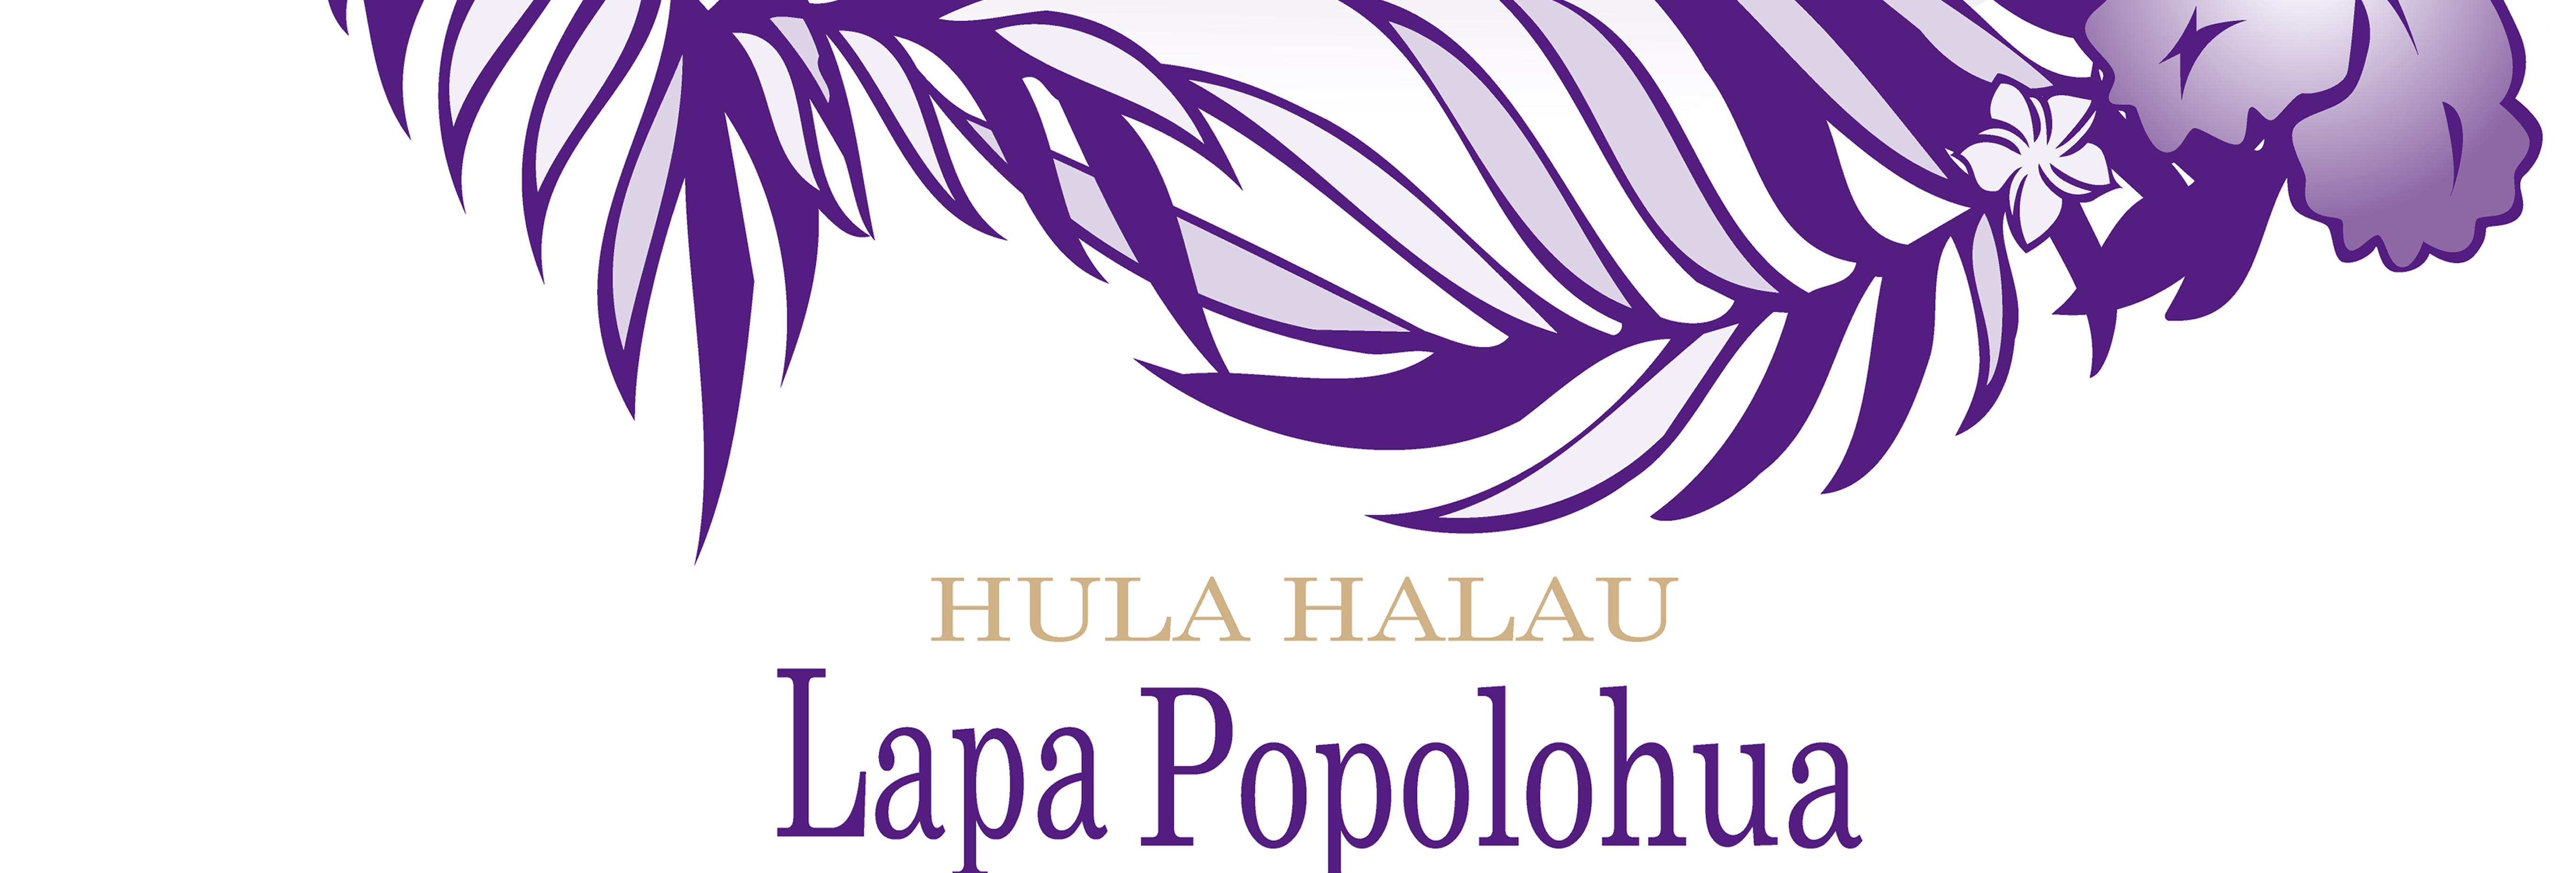 Hula Halau Lapa popolohua